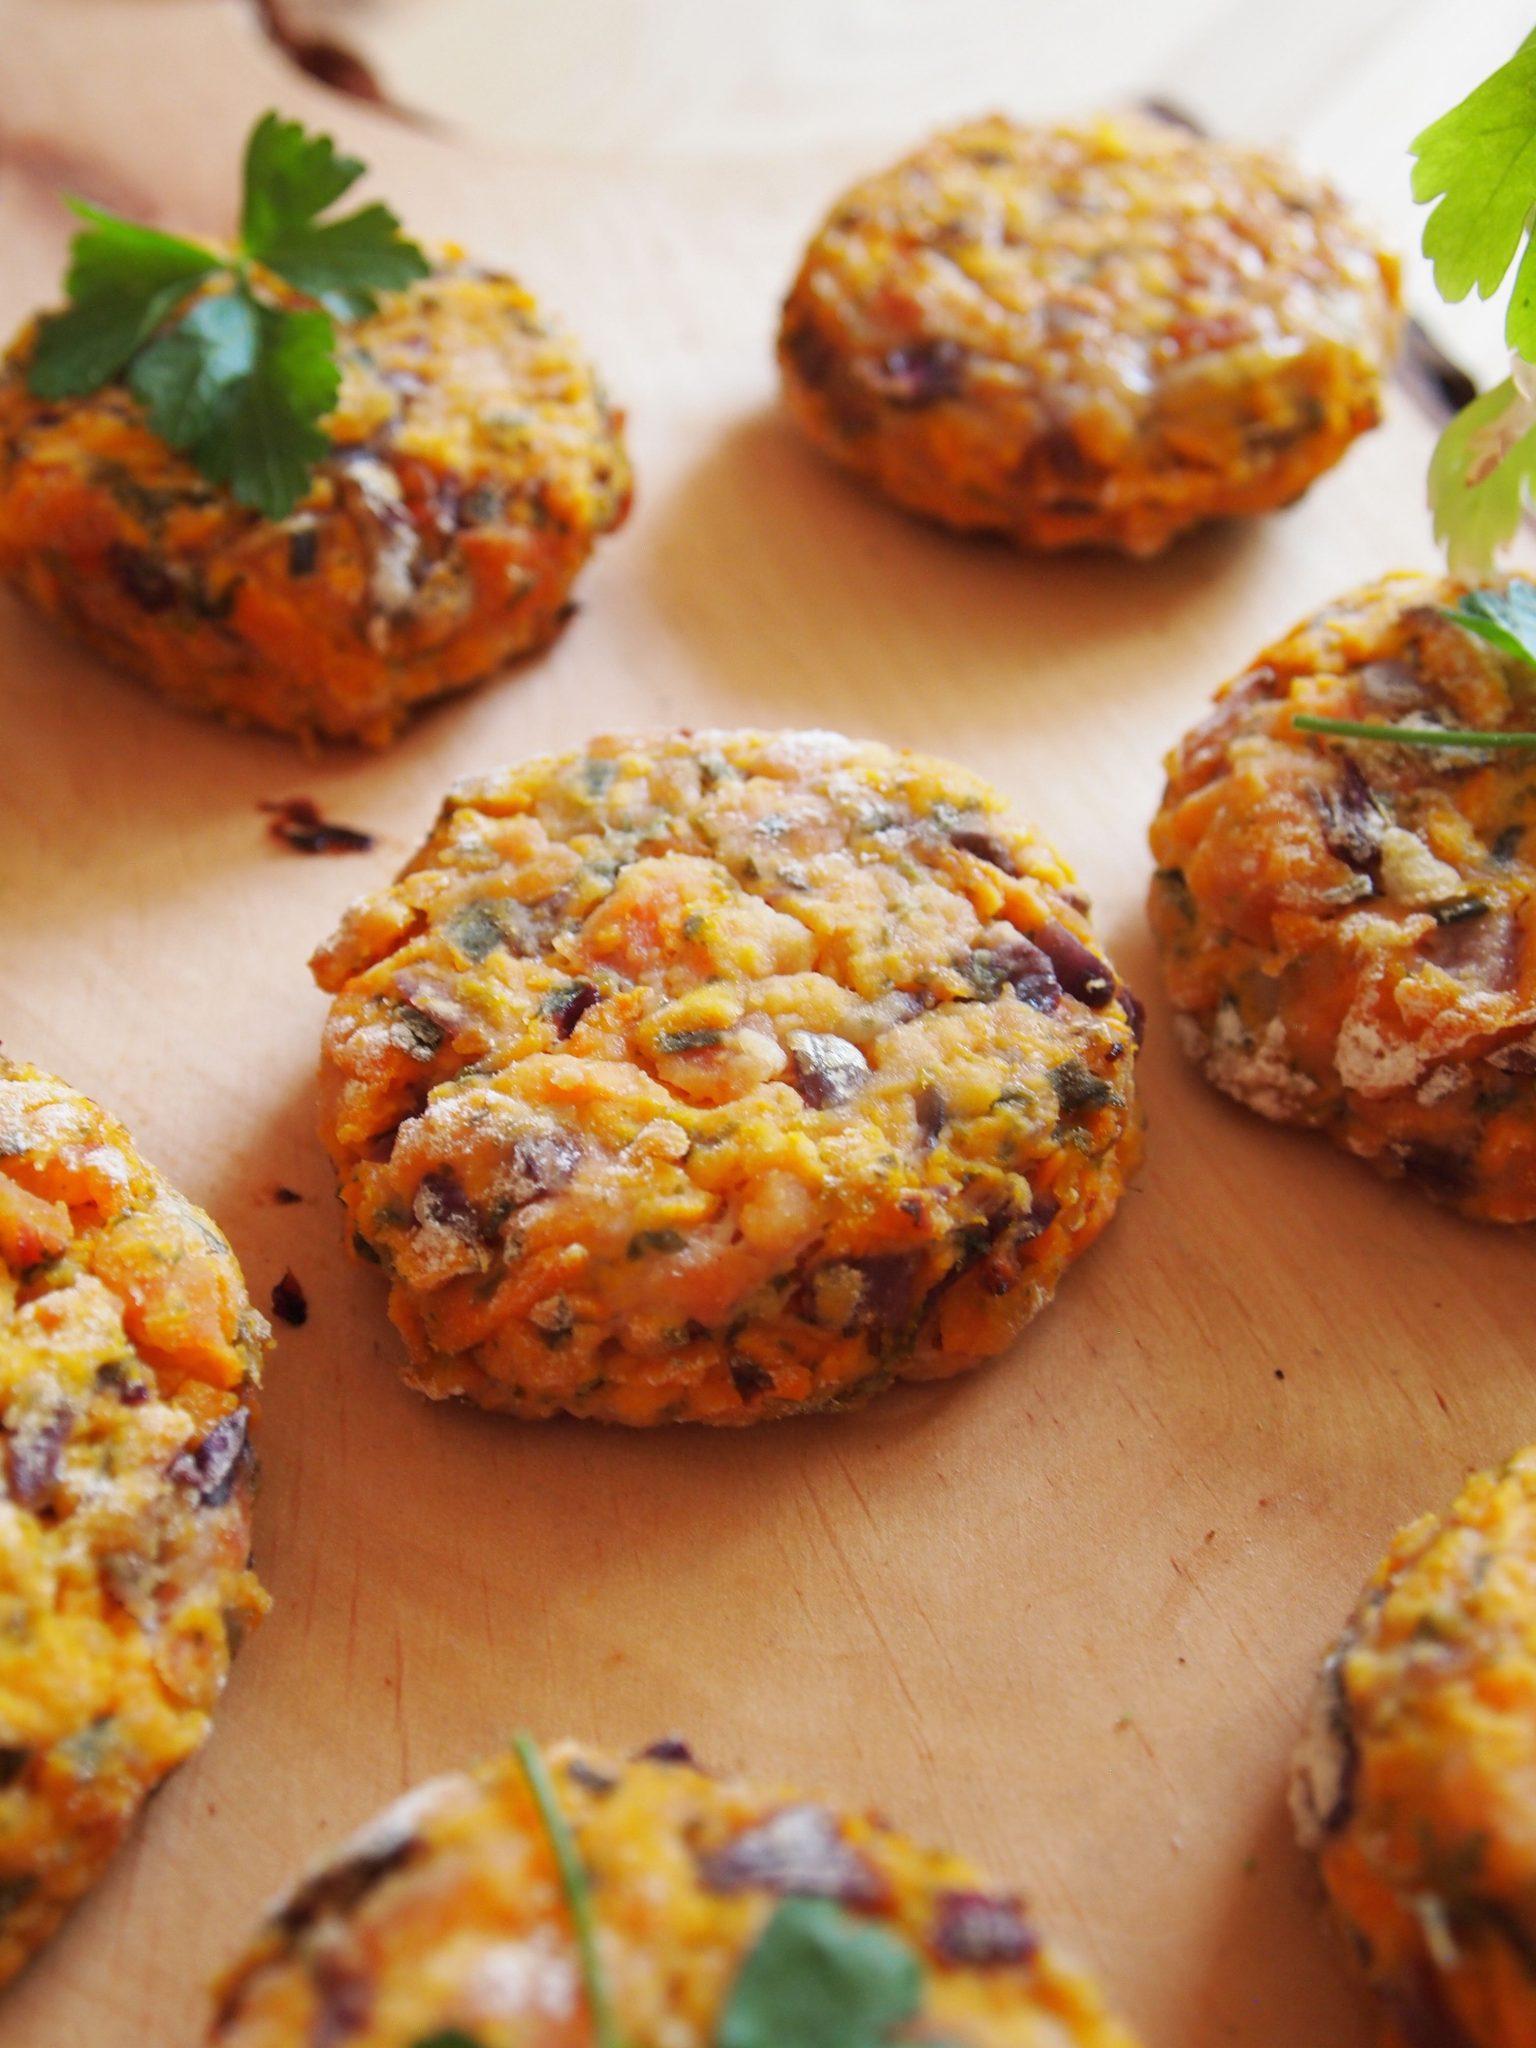 Süßkartoffel-Taler -Almofadas de batata doce